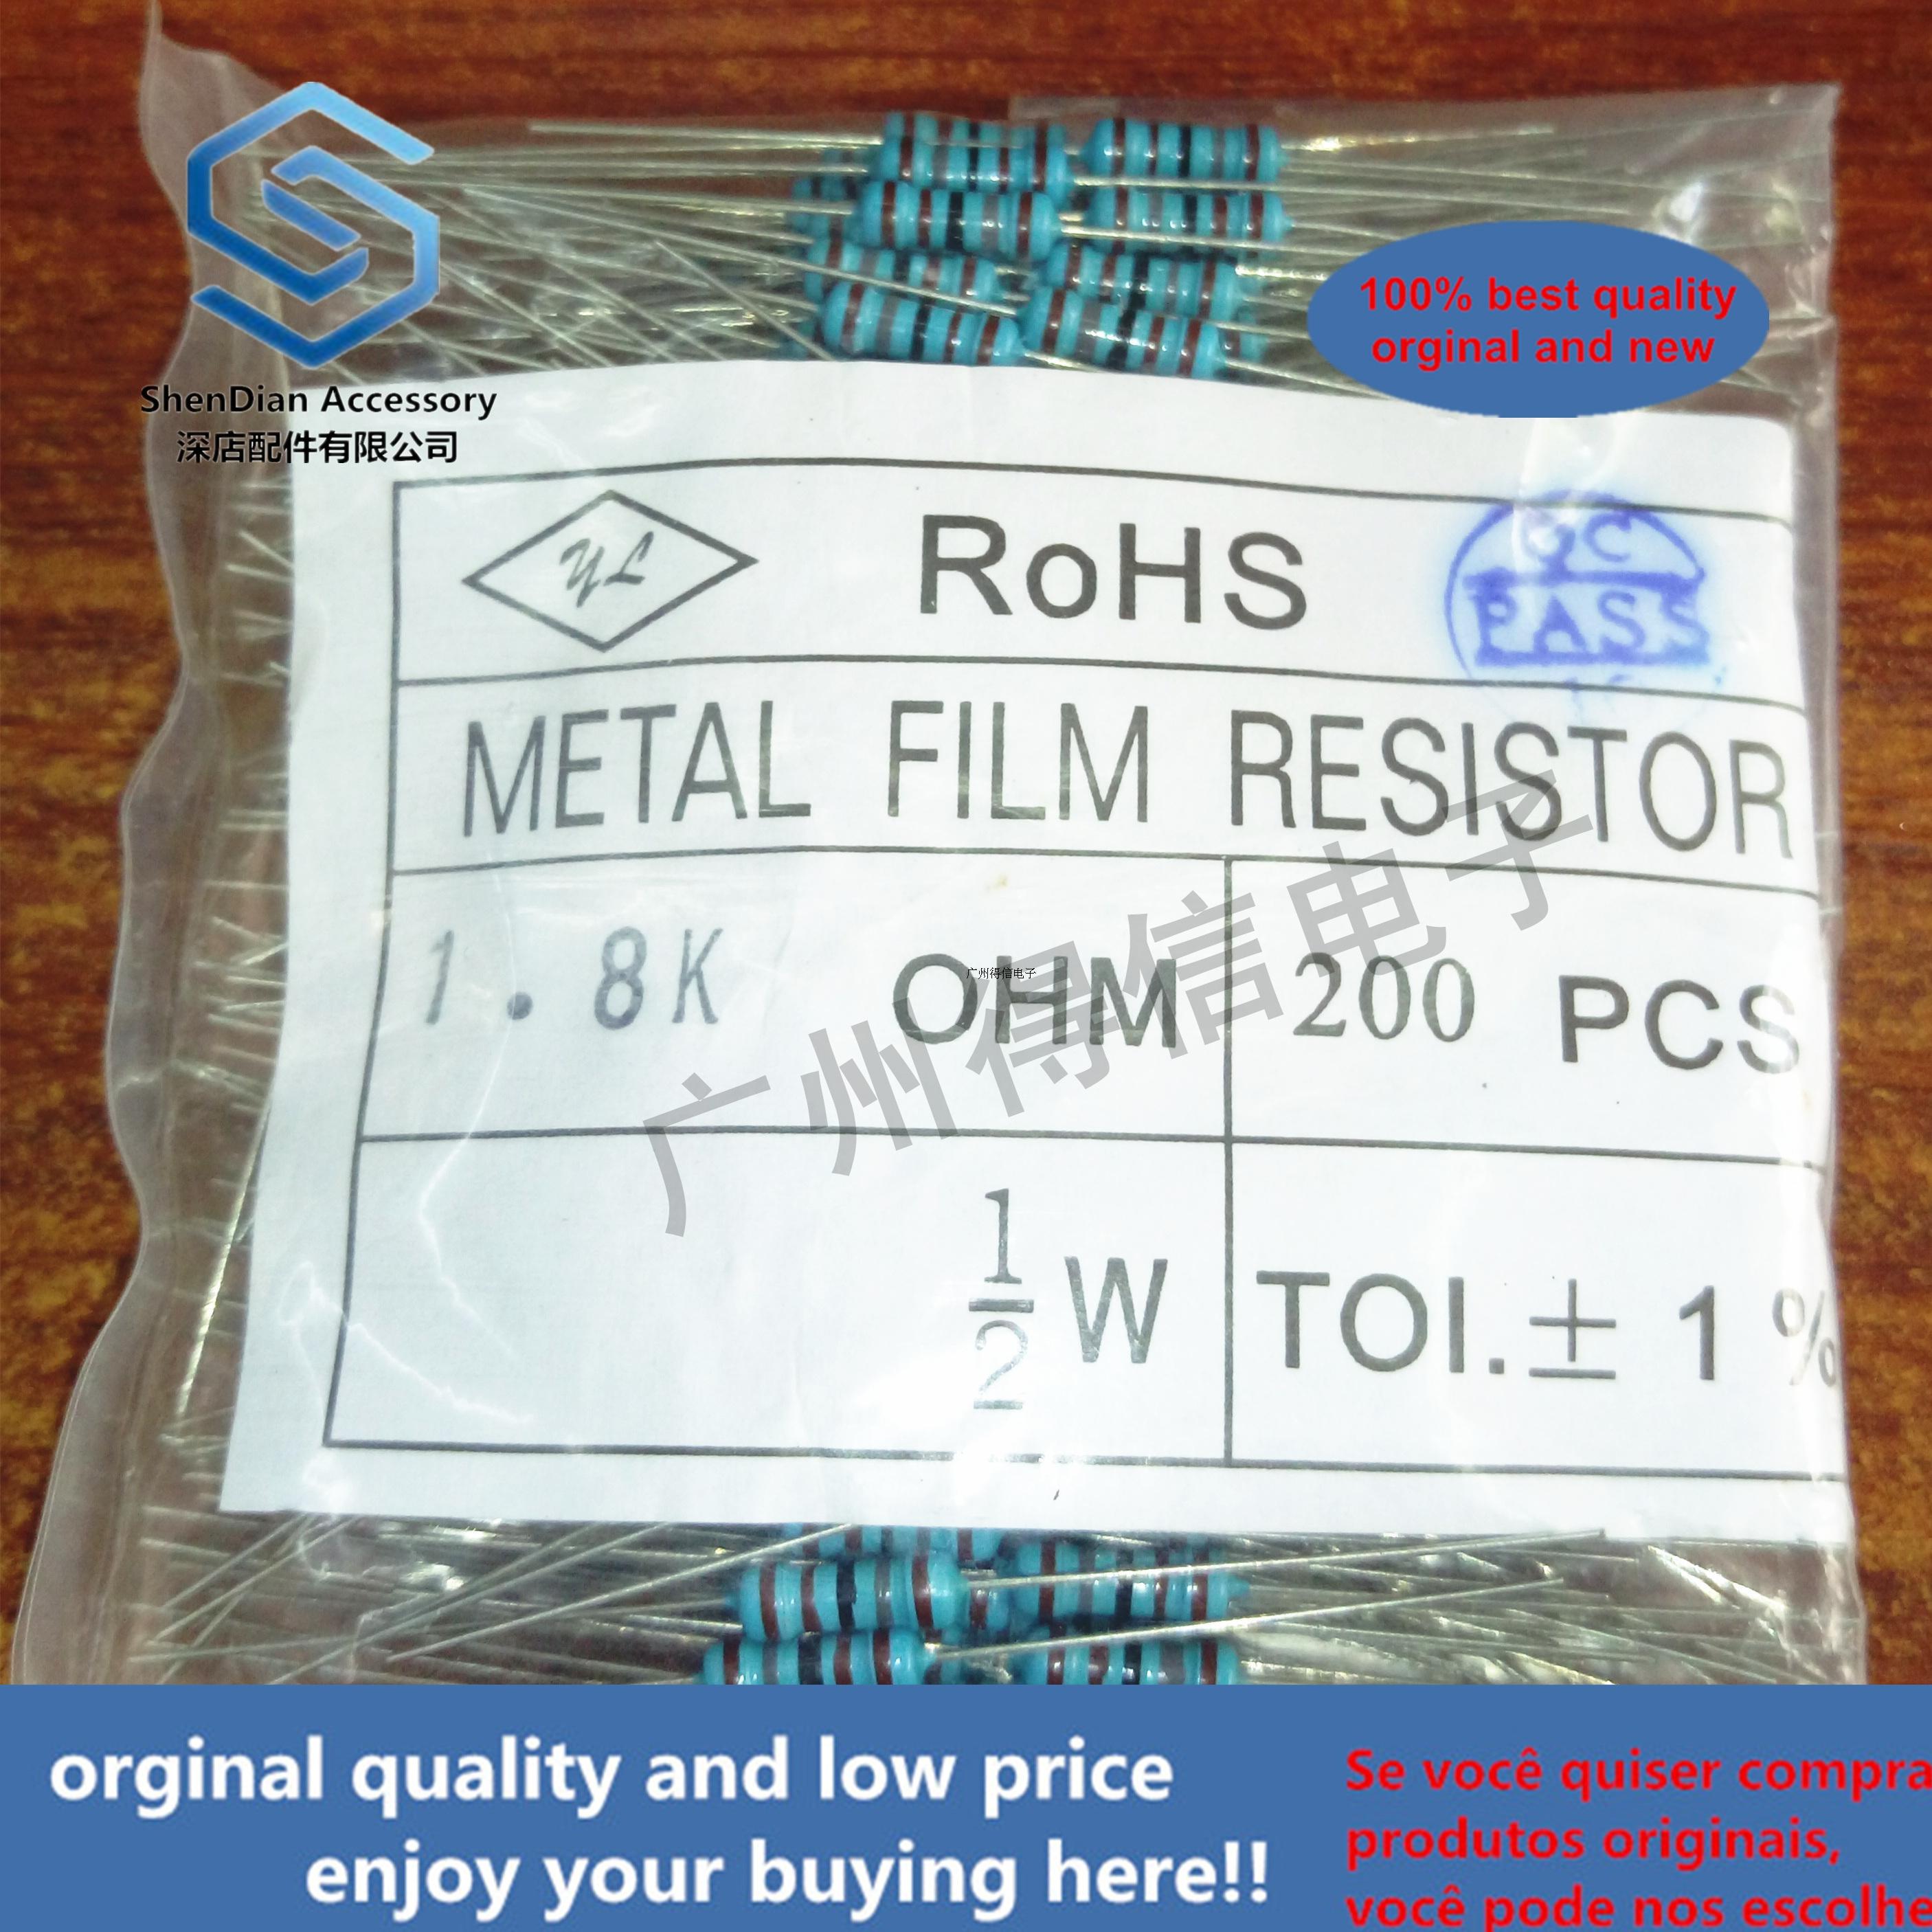 200pcs 1 / 2W 12R 12 Euro 1% Brand New Metal Film Iron Feet Resistor Bag 200 Pcs Per Pack